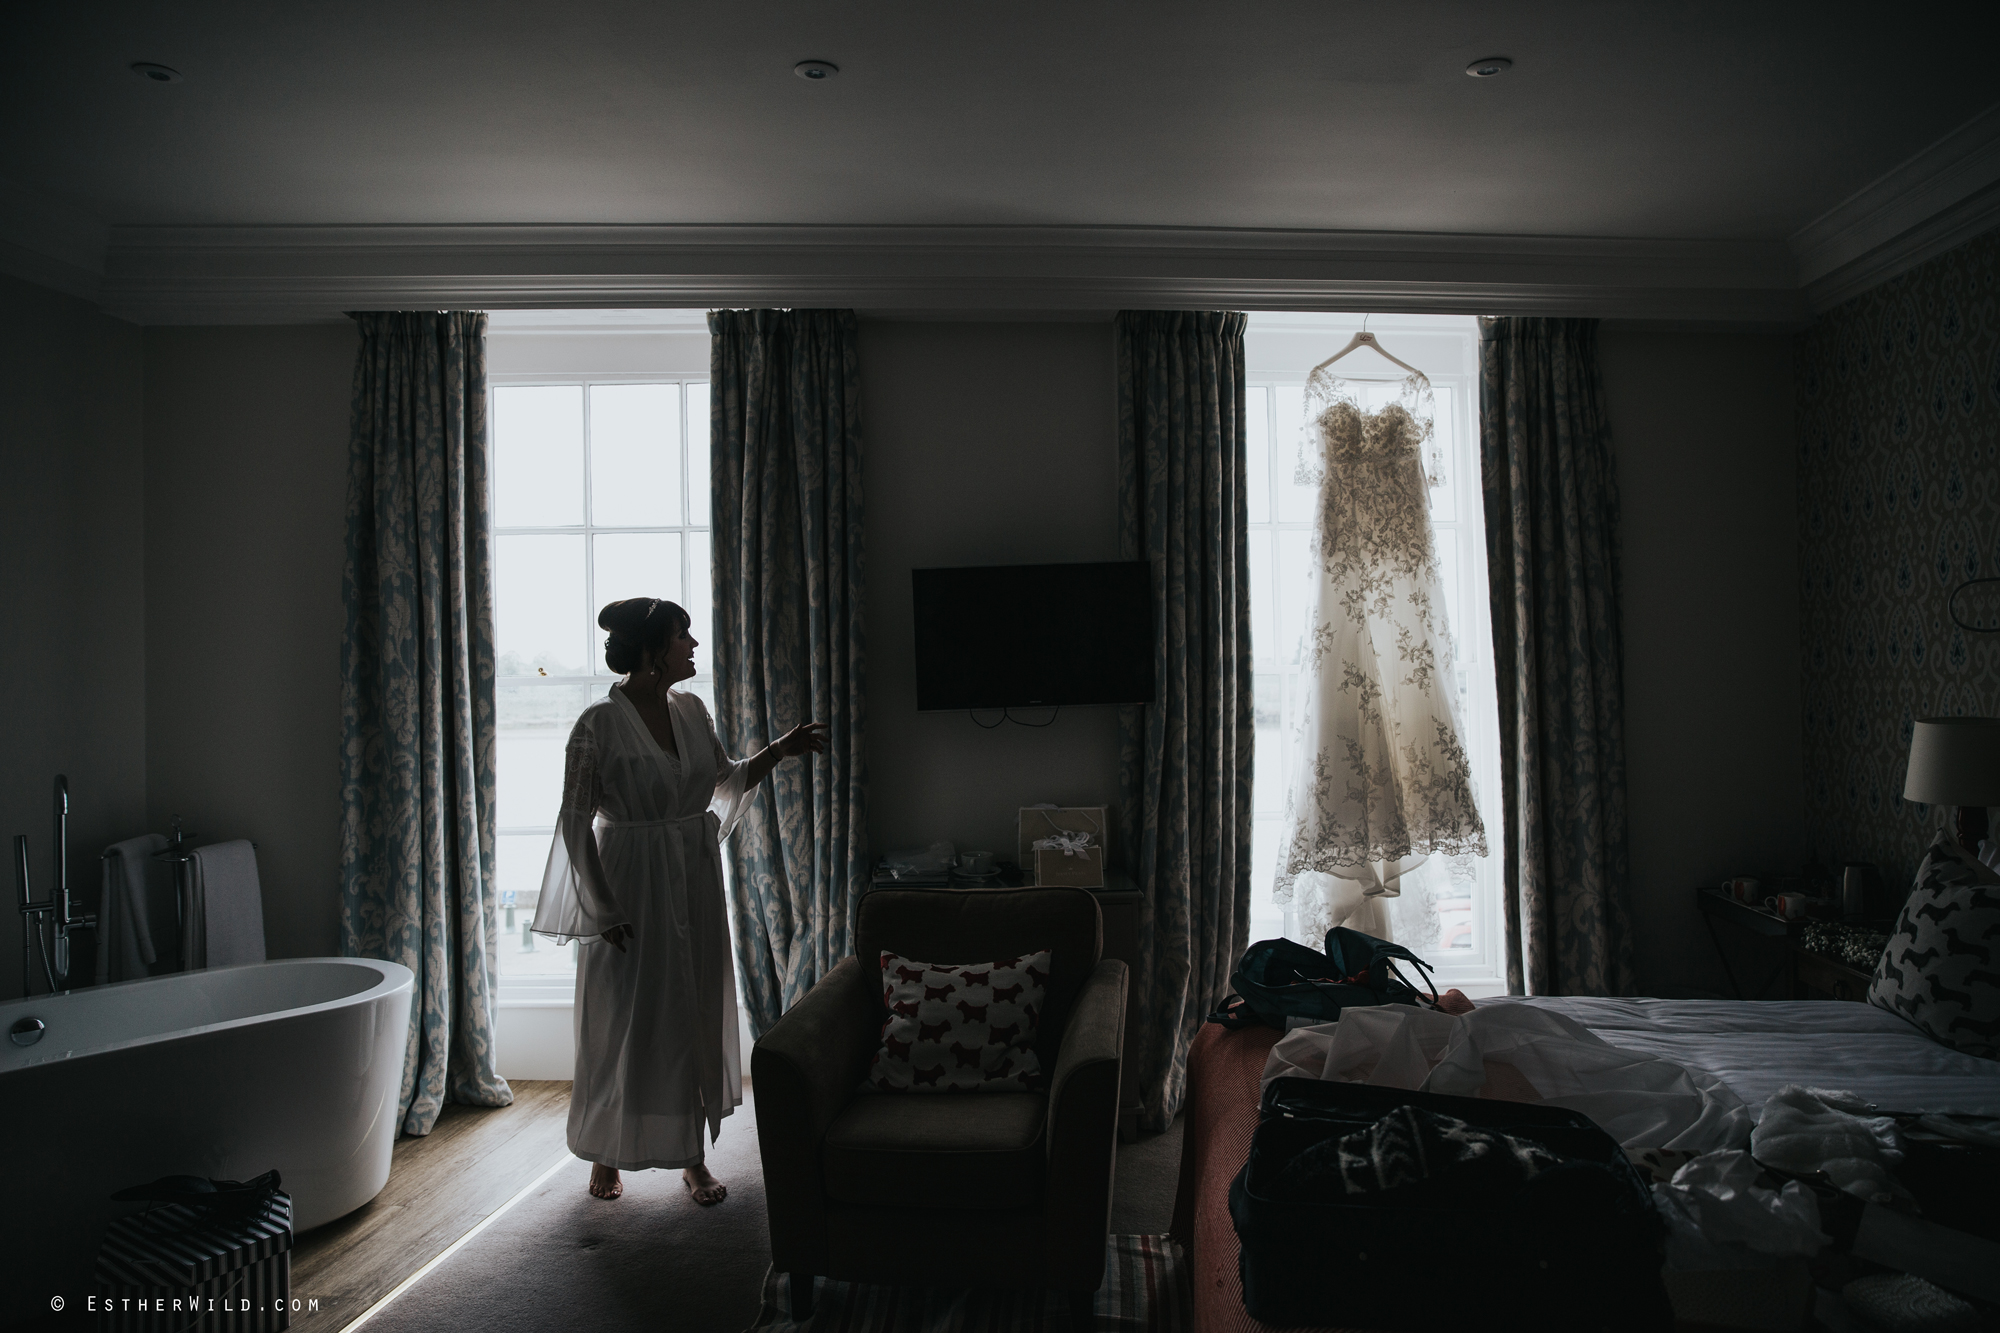 1017_Kings_Lynn_Town_Hall_Bank_House_Hotel_Wedding_Esther_Wild_PhotograpgherKings_Lynn_Town_Hall_Bank_House_Hotel_Wedding_Esther_Wild_PhotograpgherIMG_4450.jpg